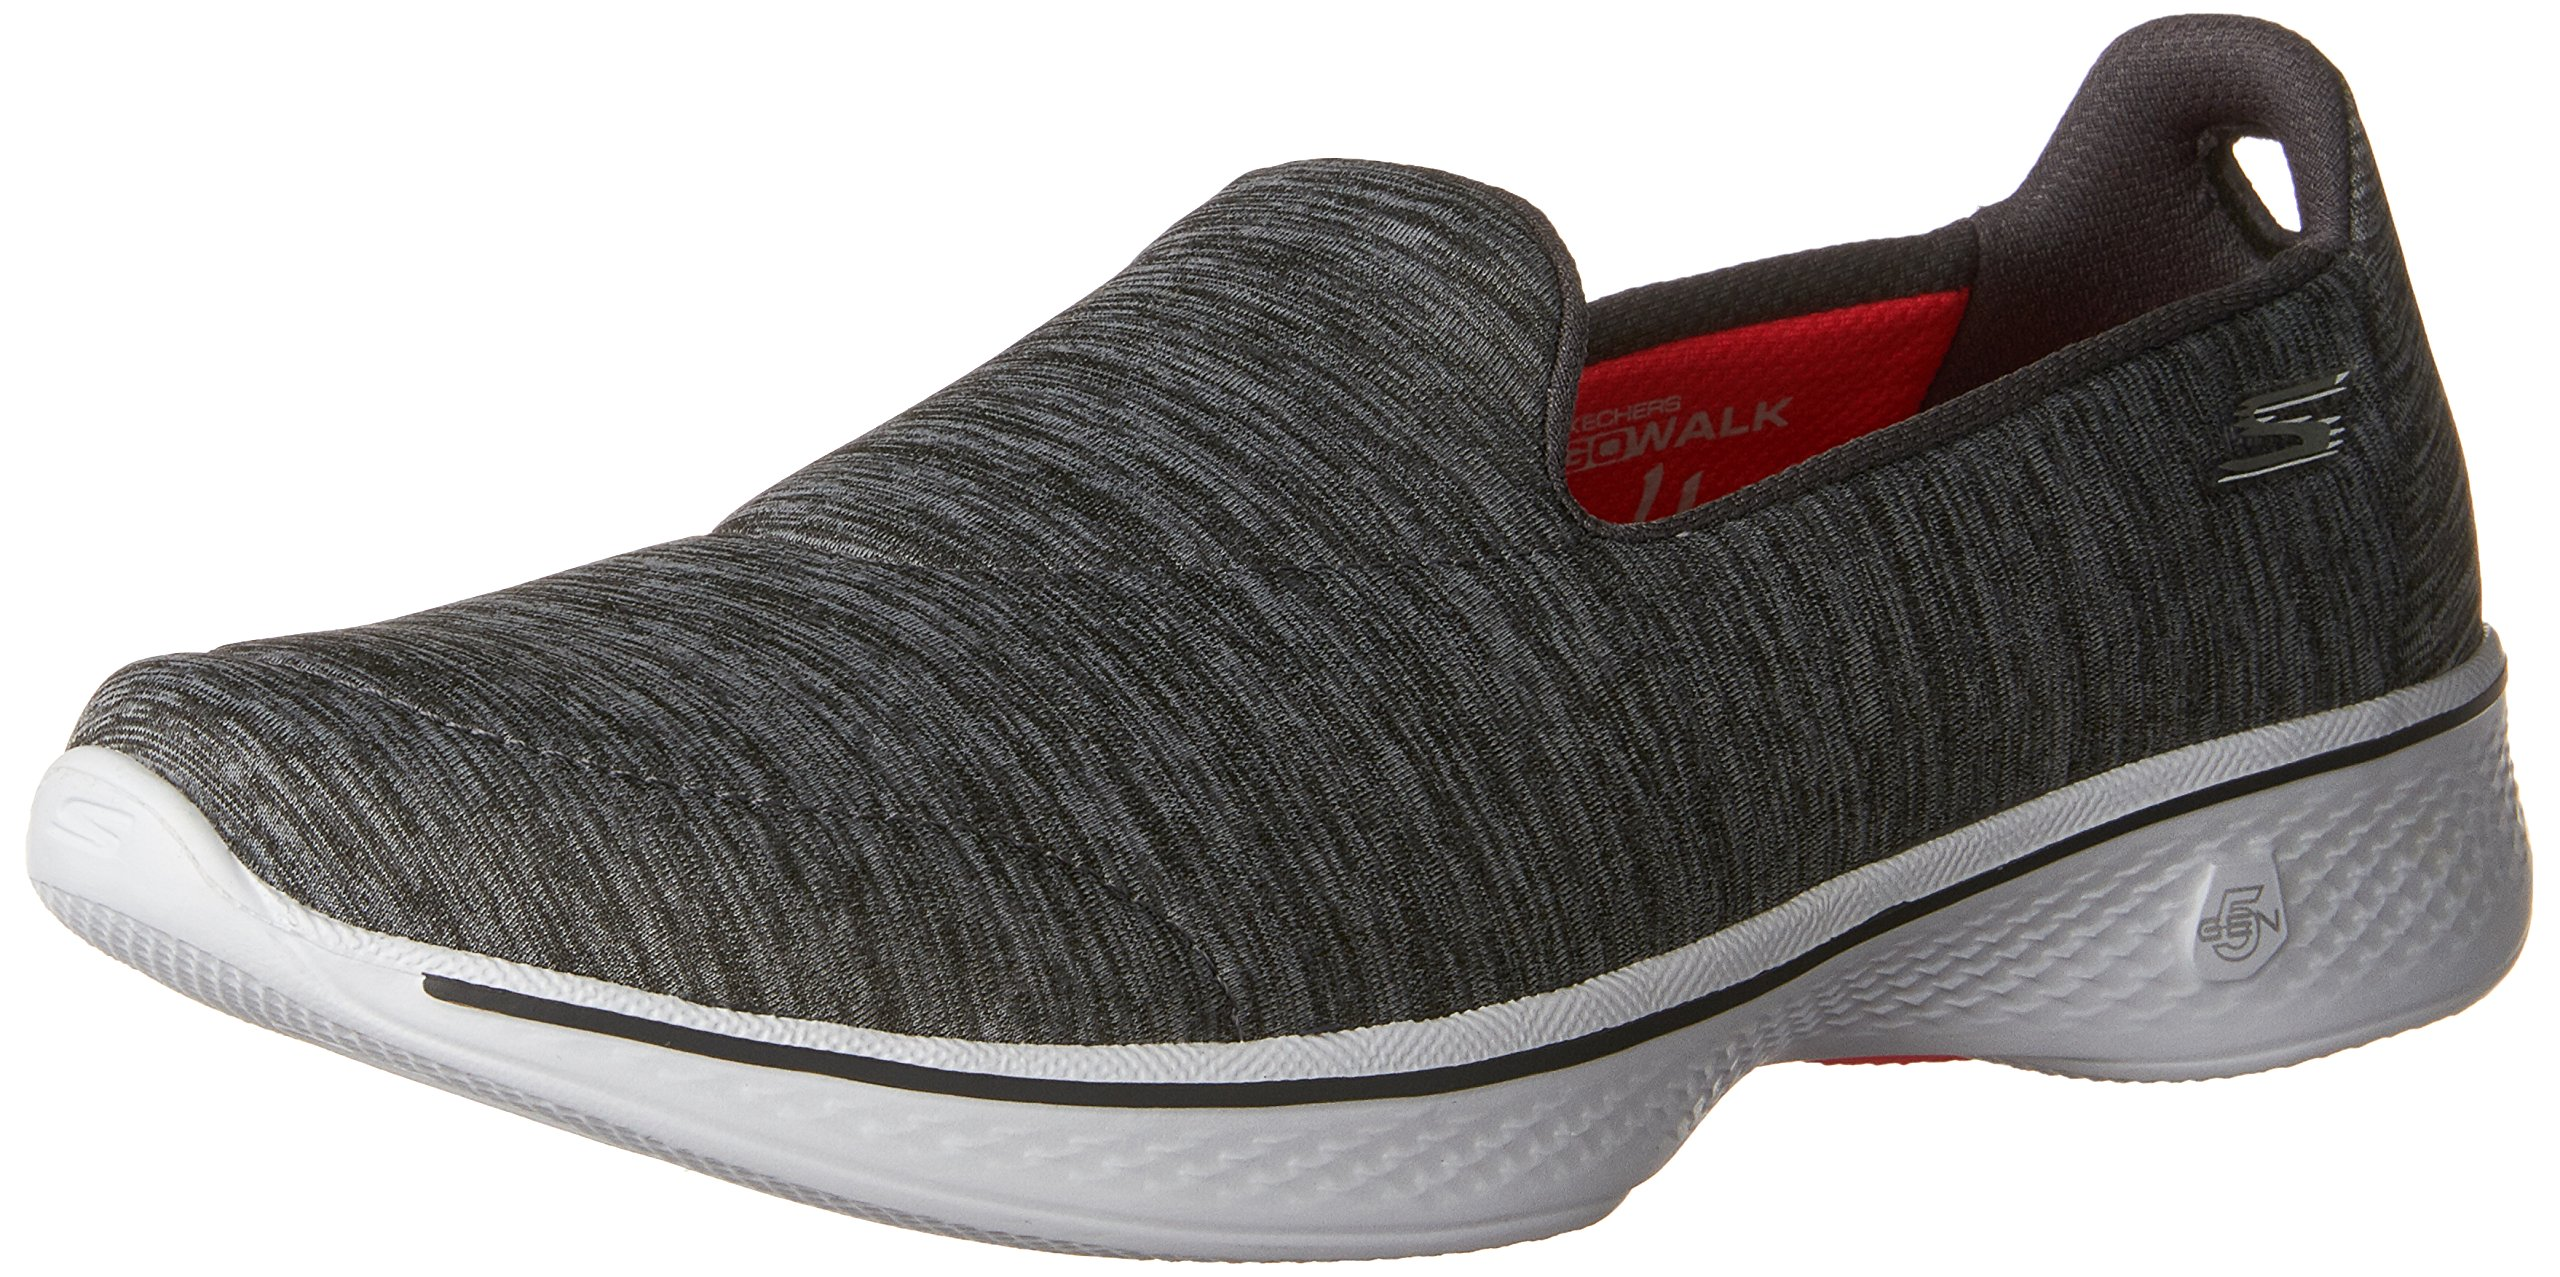 Skechers Performance Womens Go Walk 4 Achiever Walking Shoe Grey/White 6.5M  product image